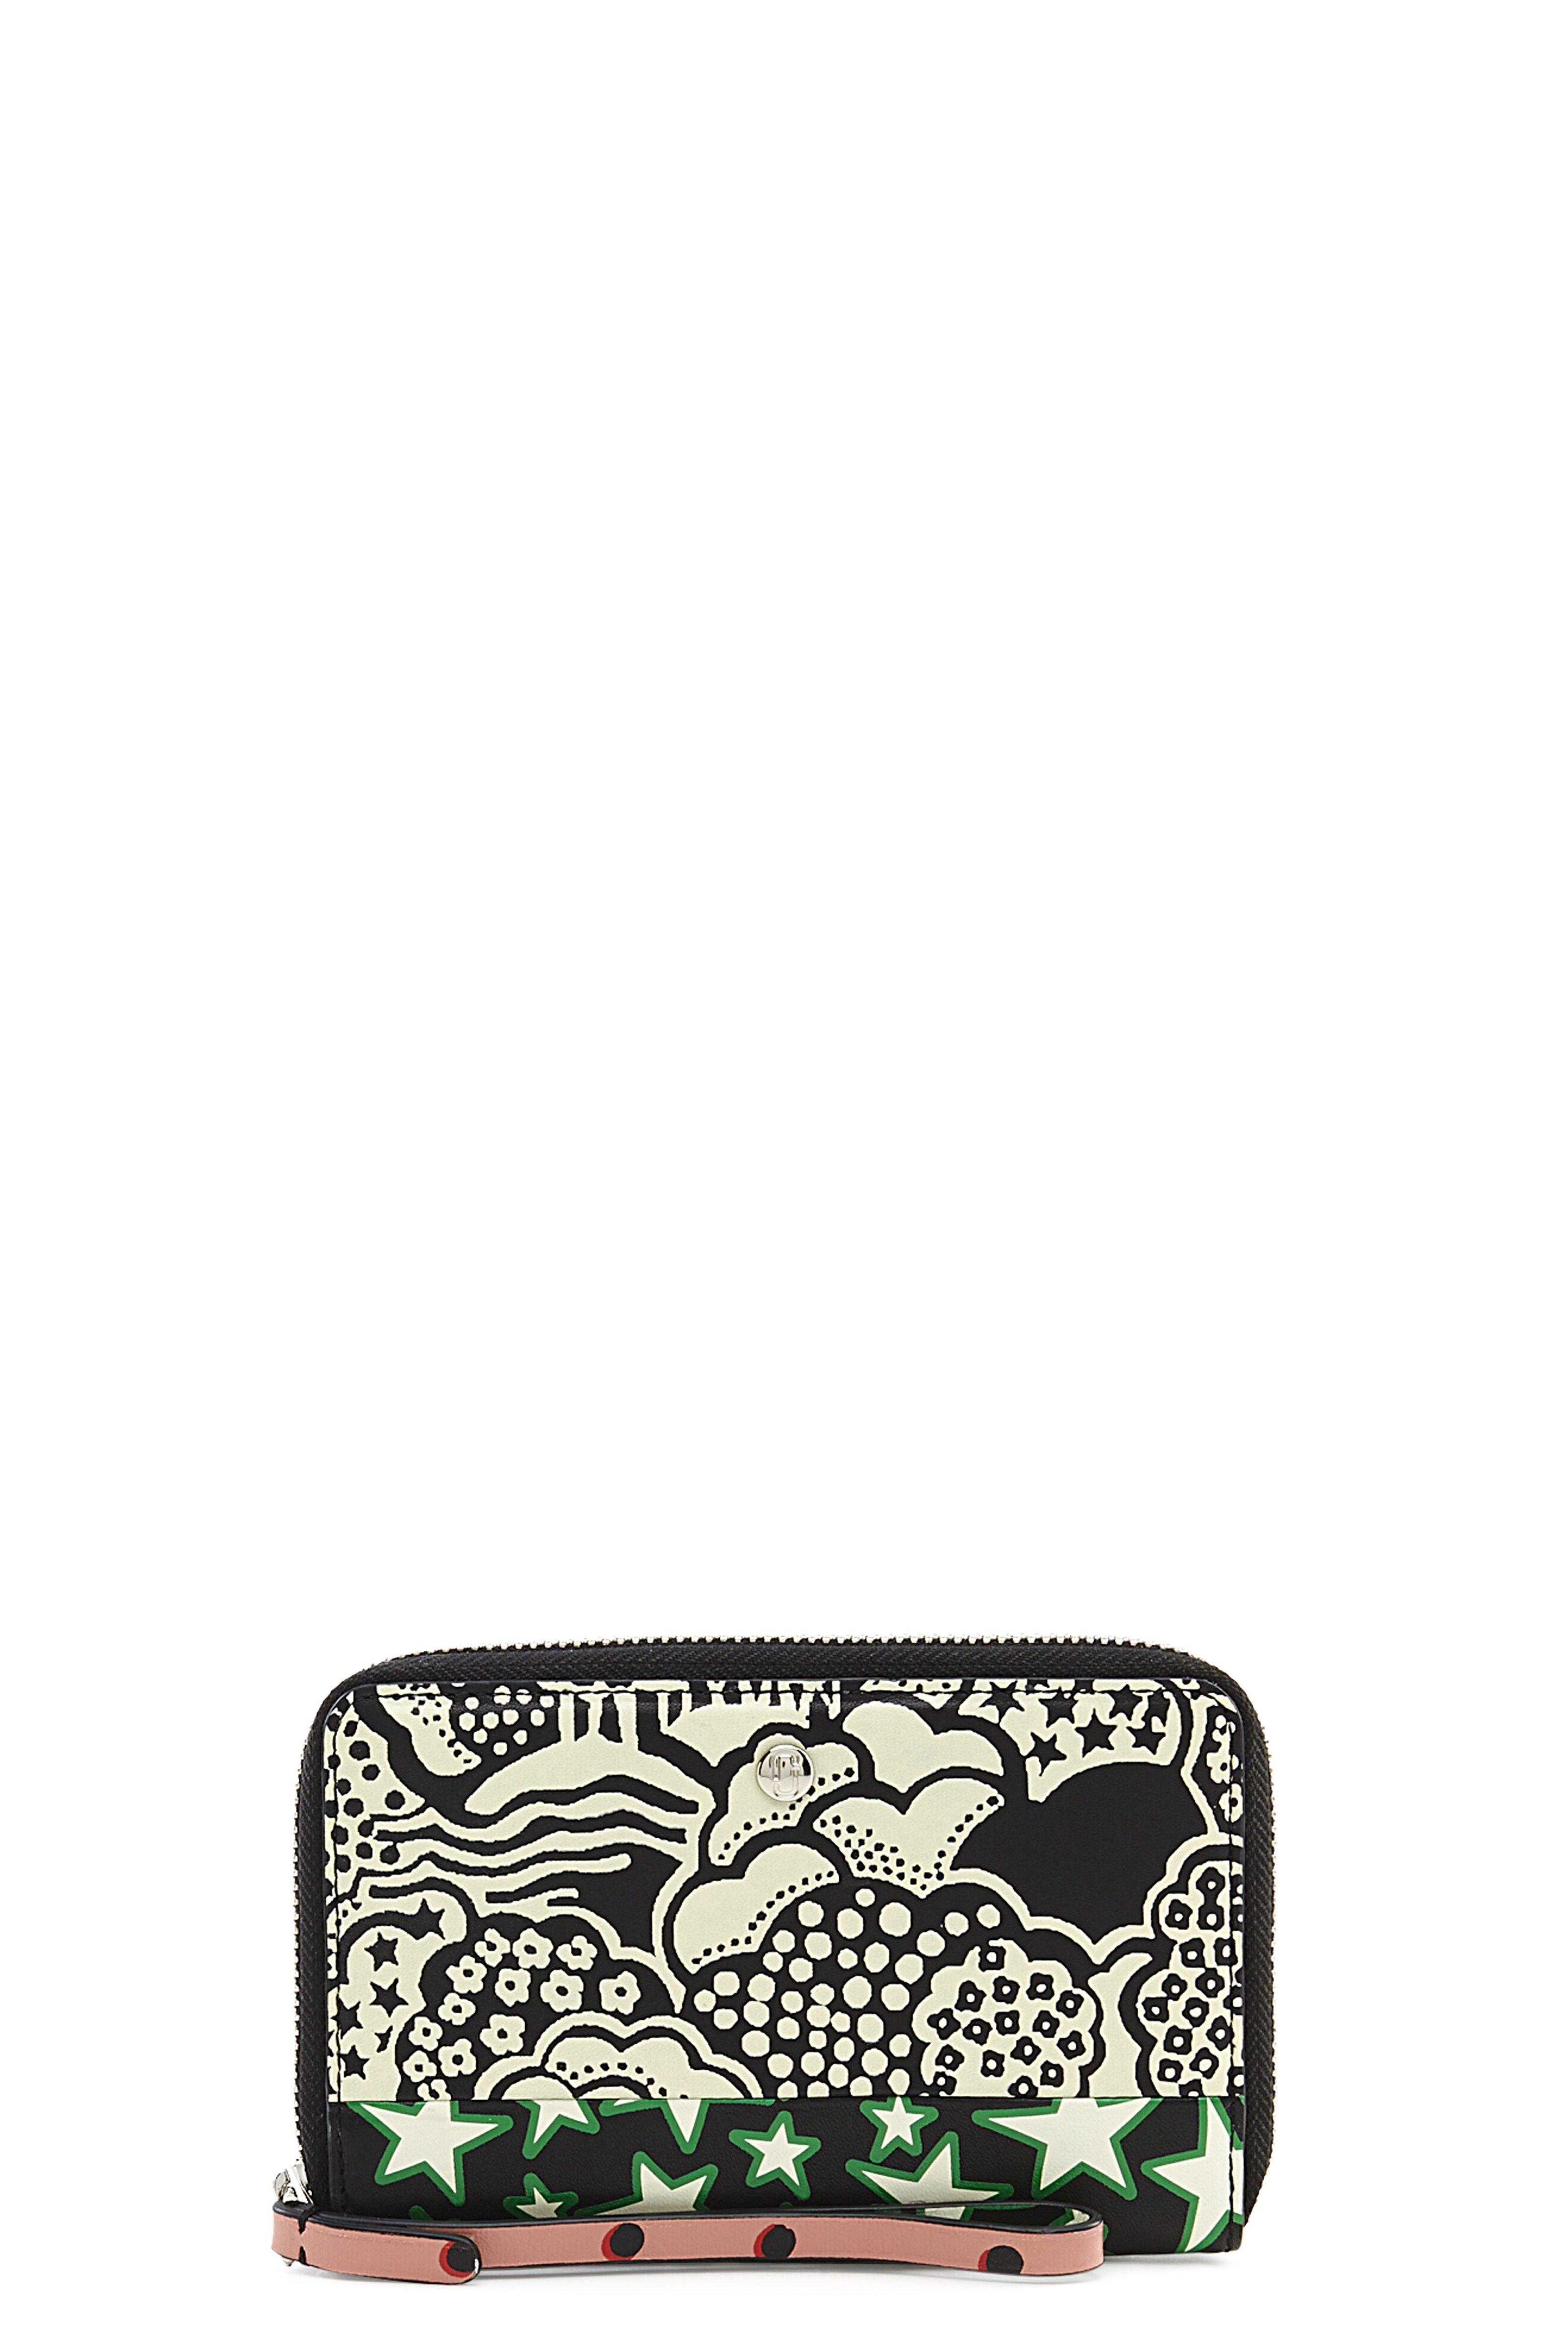 35b972206b MARC JACOBS Landscape Leather Zip Phone Wristlet. #marcjacobs #bags  #leather #pouch